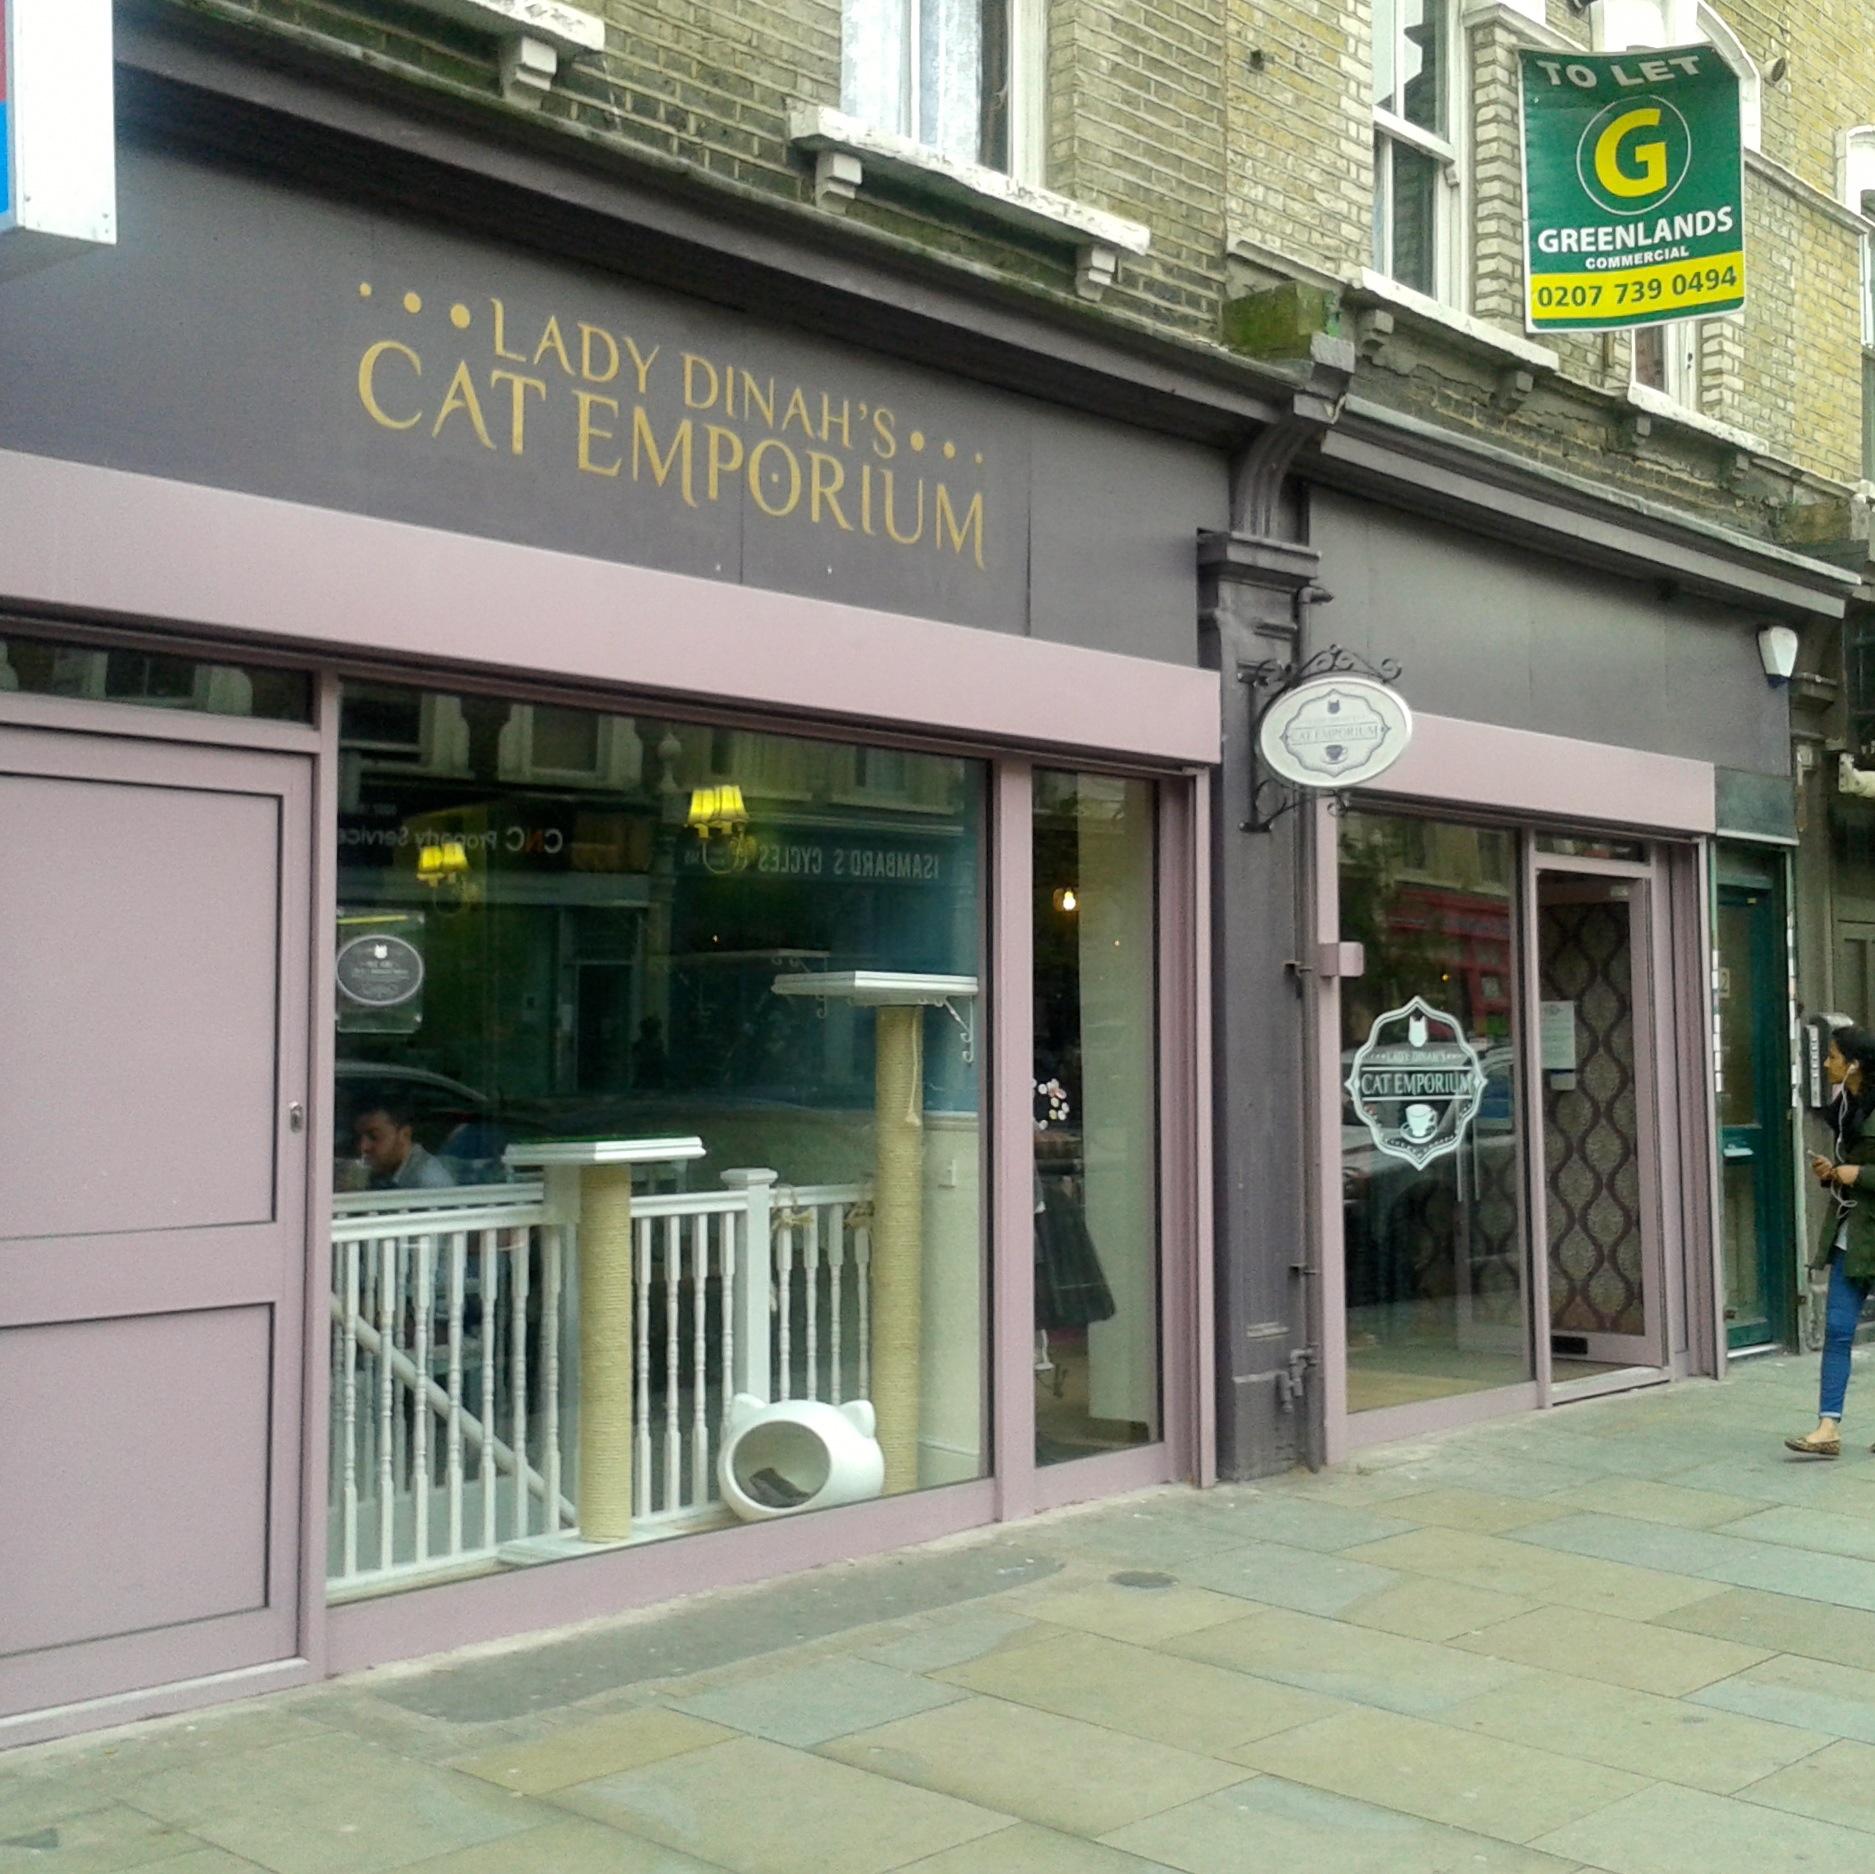 https://i1.wp.com/fatgayvegan.com/wp-content/uploads/2014/04/cat-cafe.jpg?fit=1875%2C1874